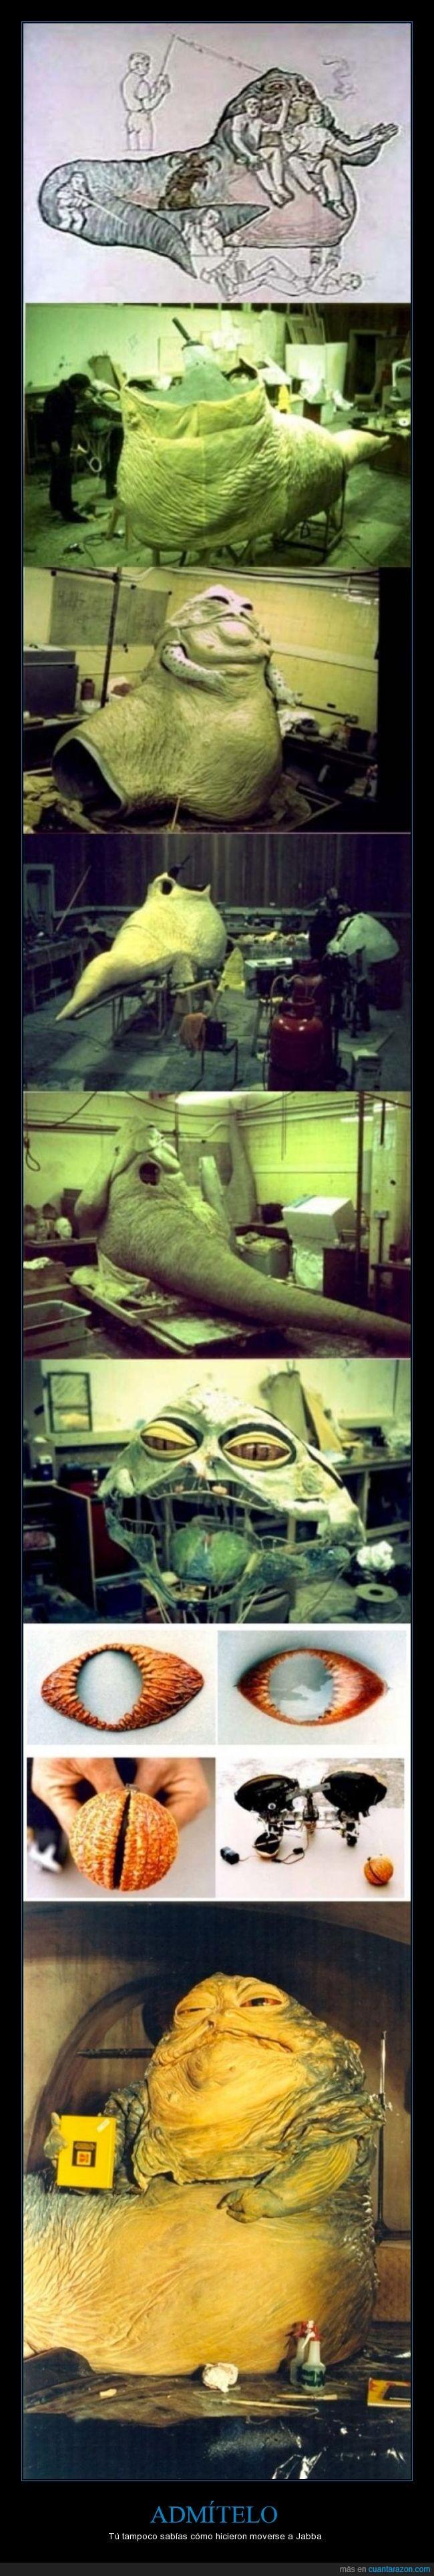 dentro,Jabba el Hutt,maqueta,marioneta,movimiento,muñeco,pelicula,Star Wars